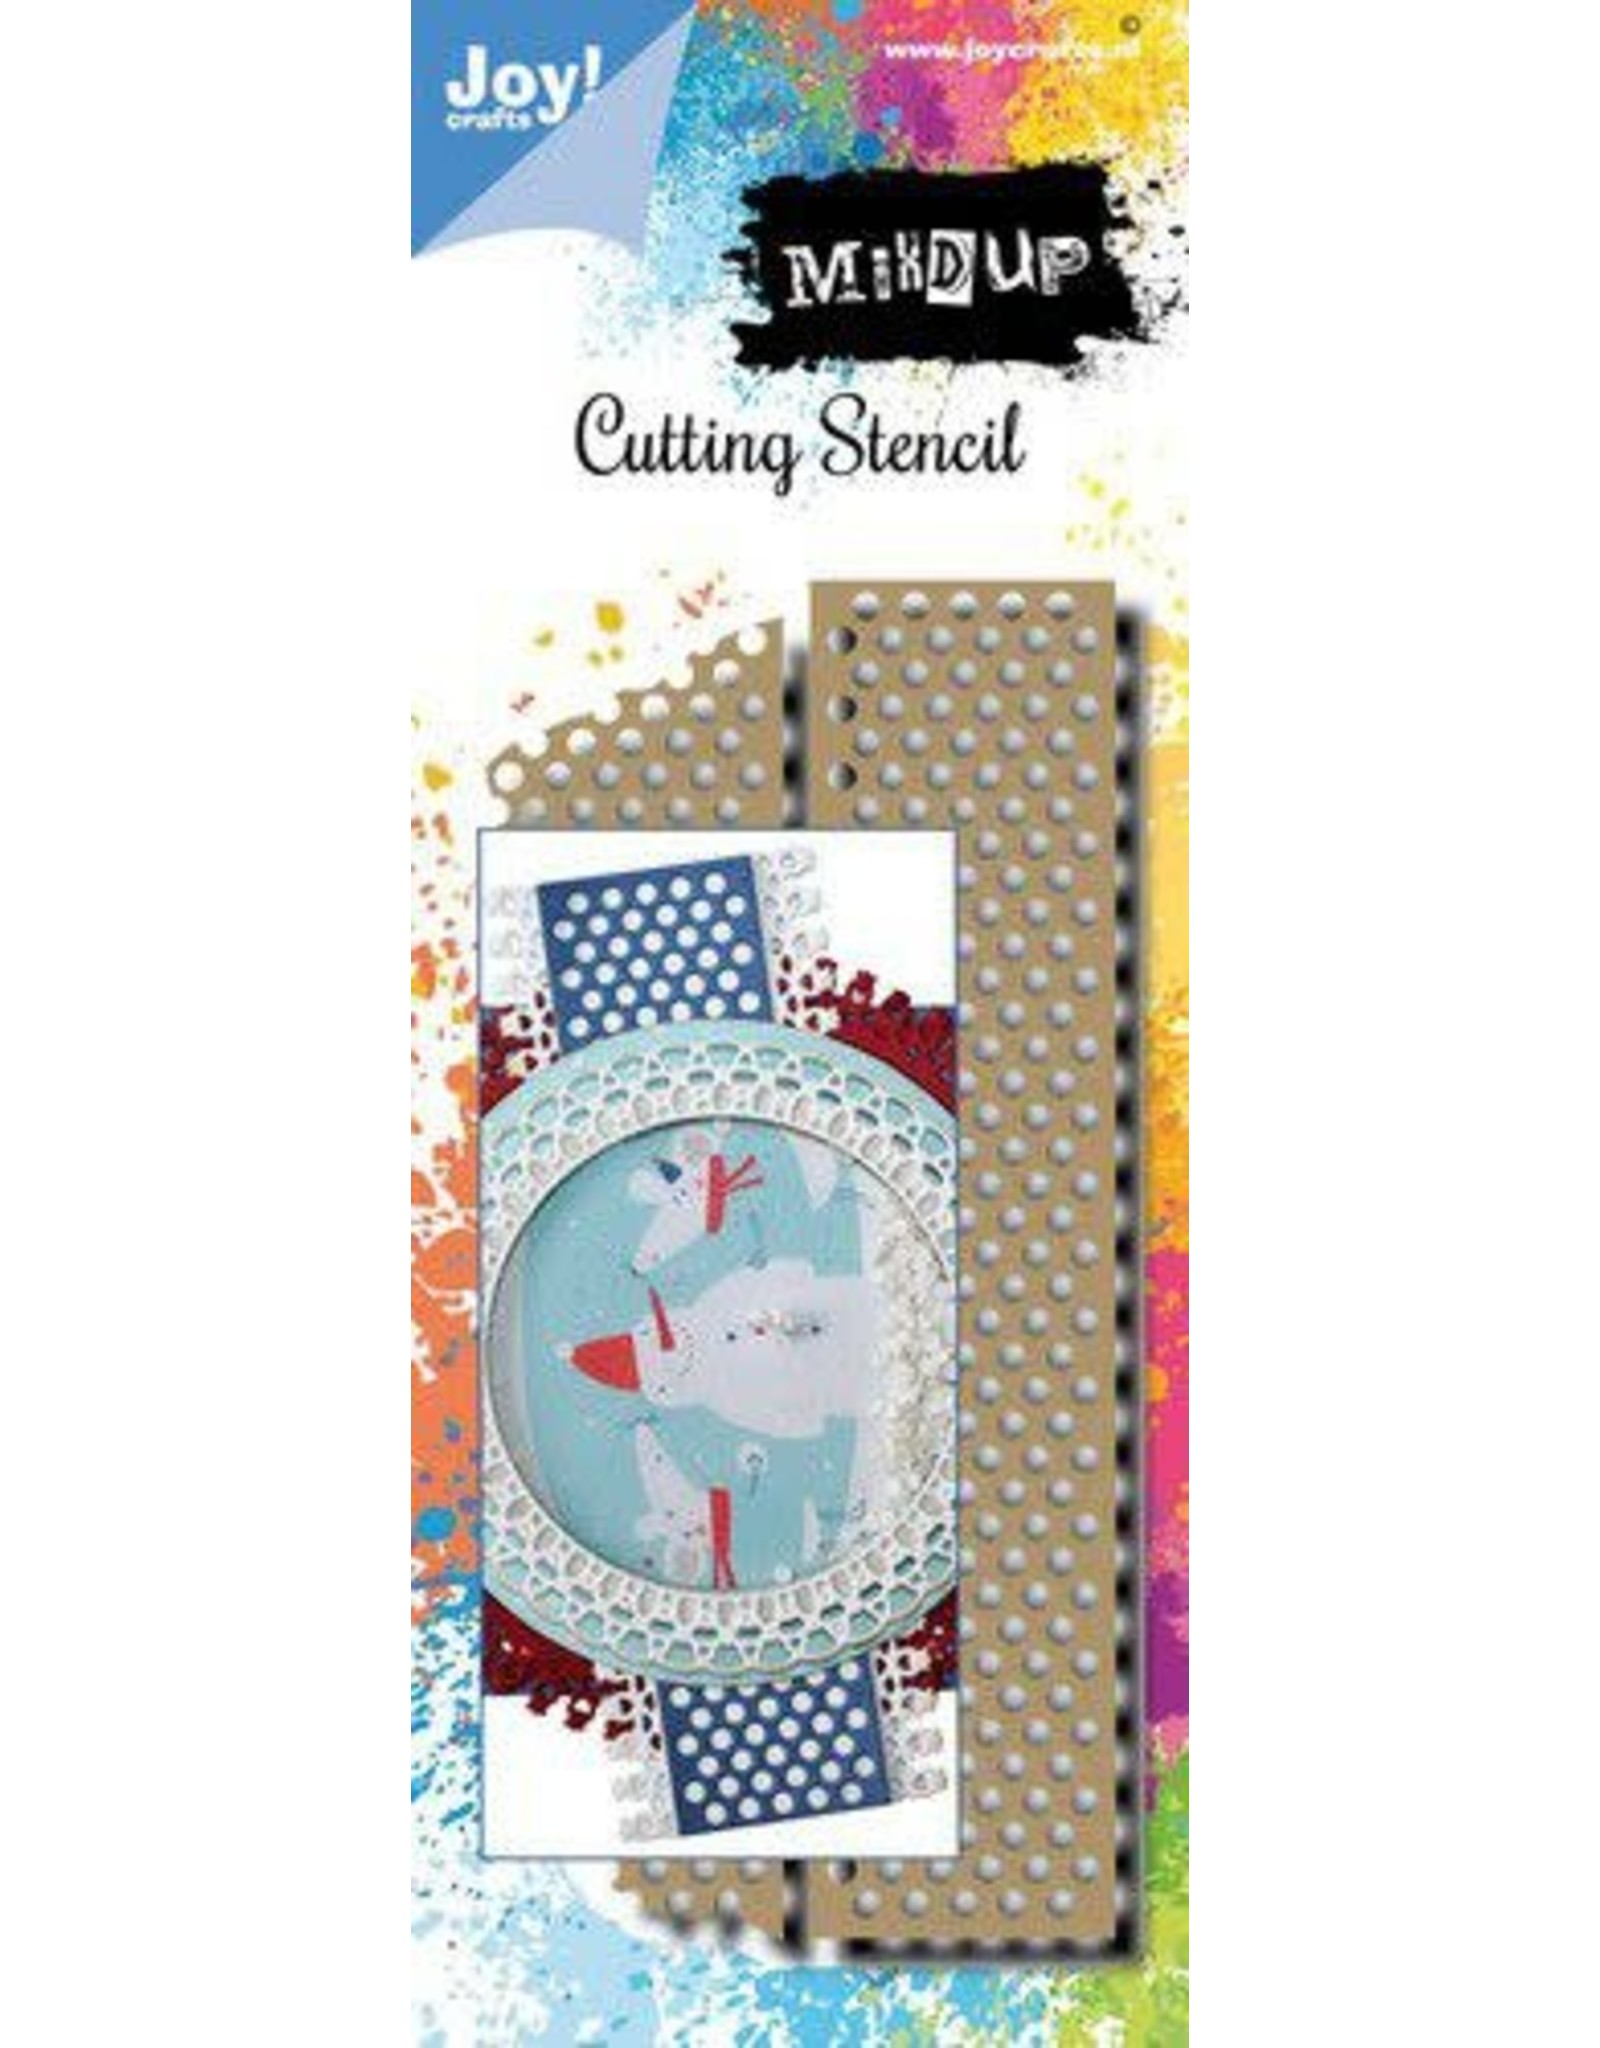 Joy Craft Joy! Crafts Stansmal - Noor - Mixed Up - Tape 6002/1564 139x61,5mm